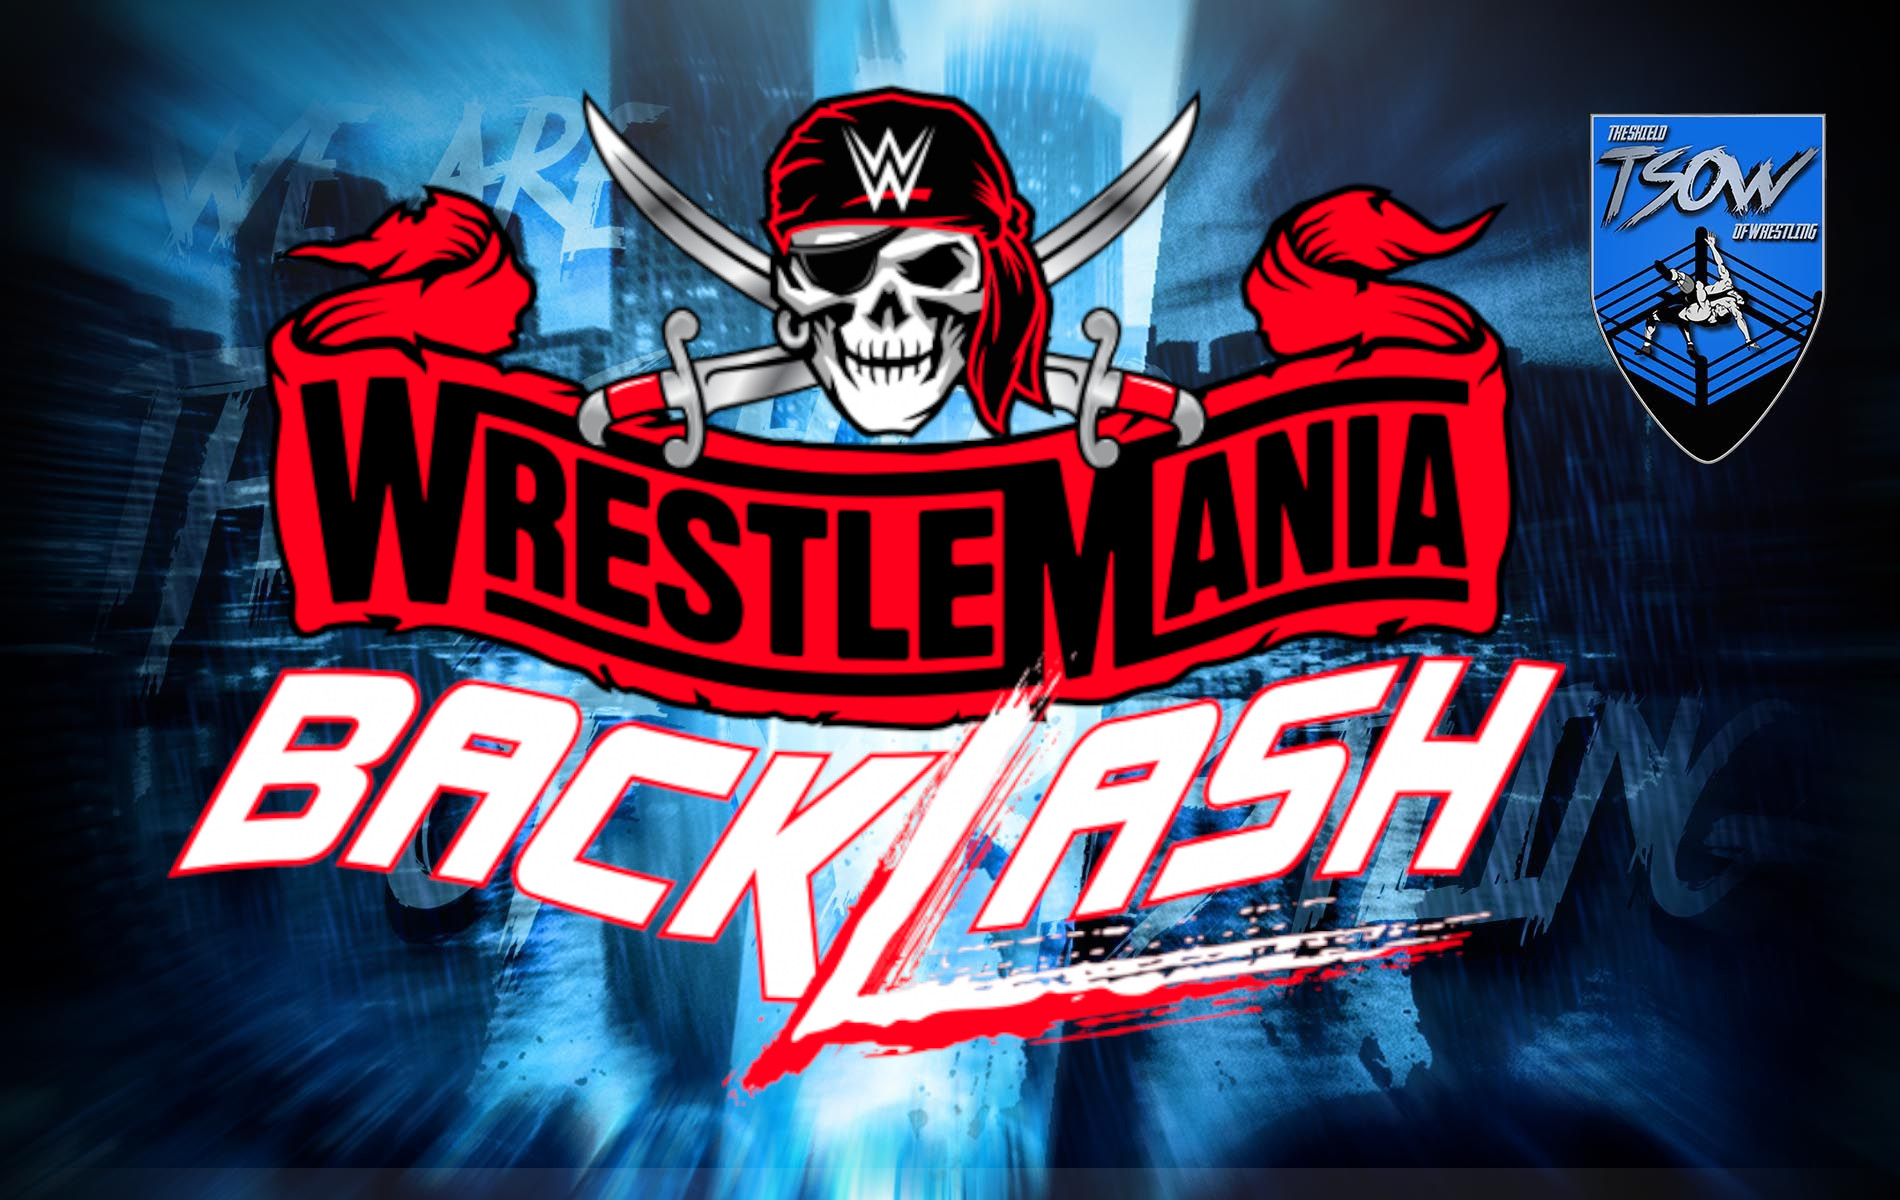 WrestleMania Backlash: le quote per le scommesse